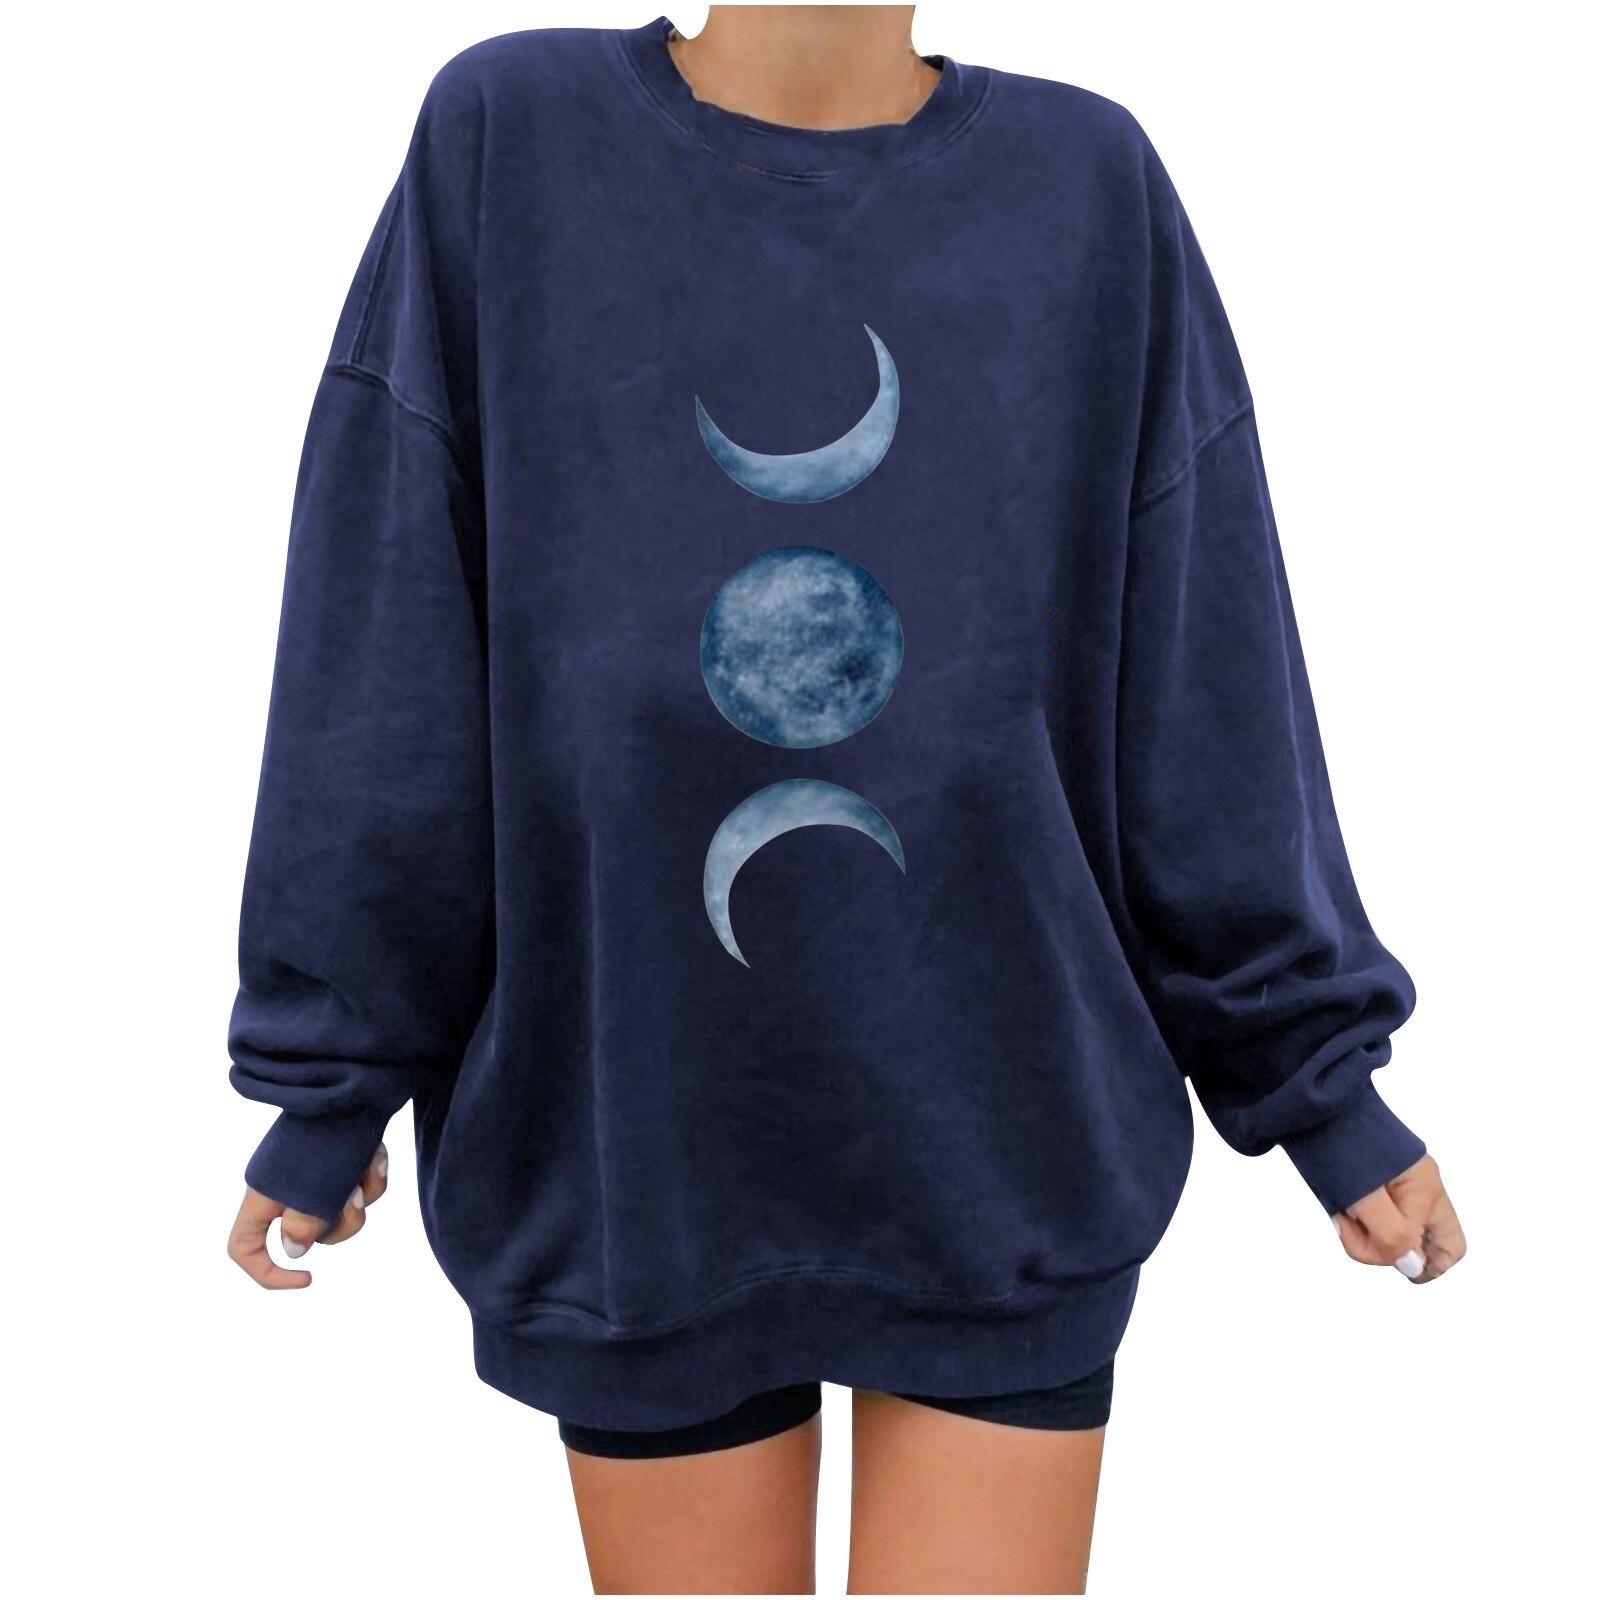 long sleeve scrawl printed v neck tee Moon Personalized Printed O-Neck Sweater Long Sleeve Loose Fashion Women's T-shirt Sweater Casual Female Tee Top